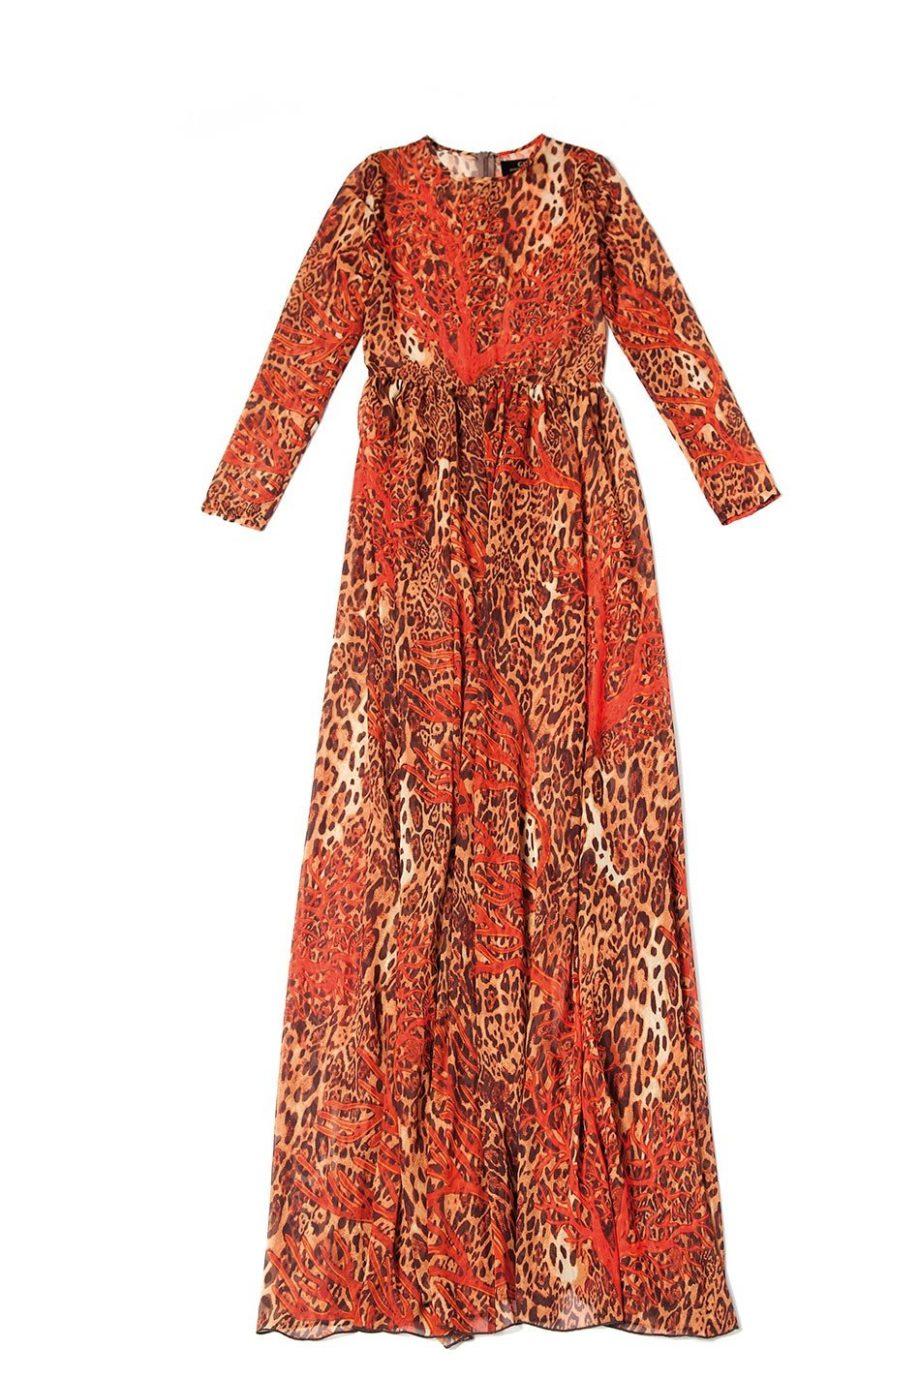 CORAL CHEETAH DRESS